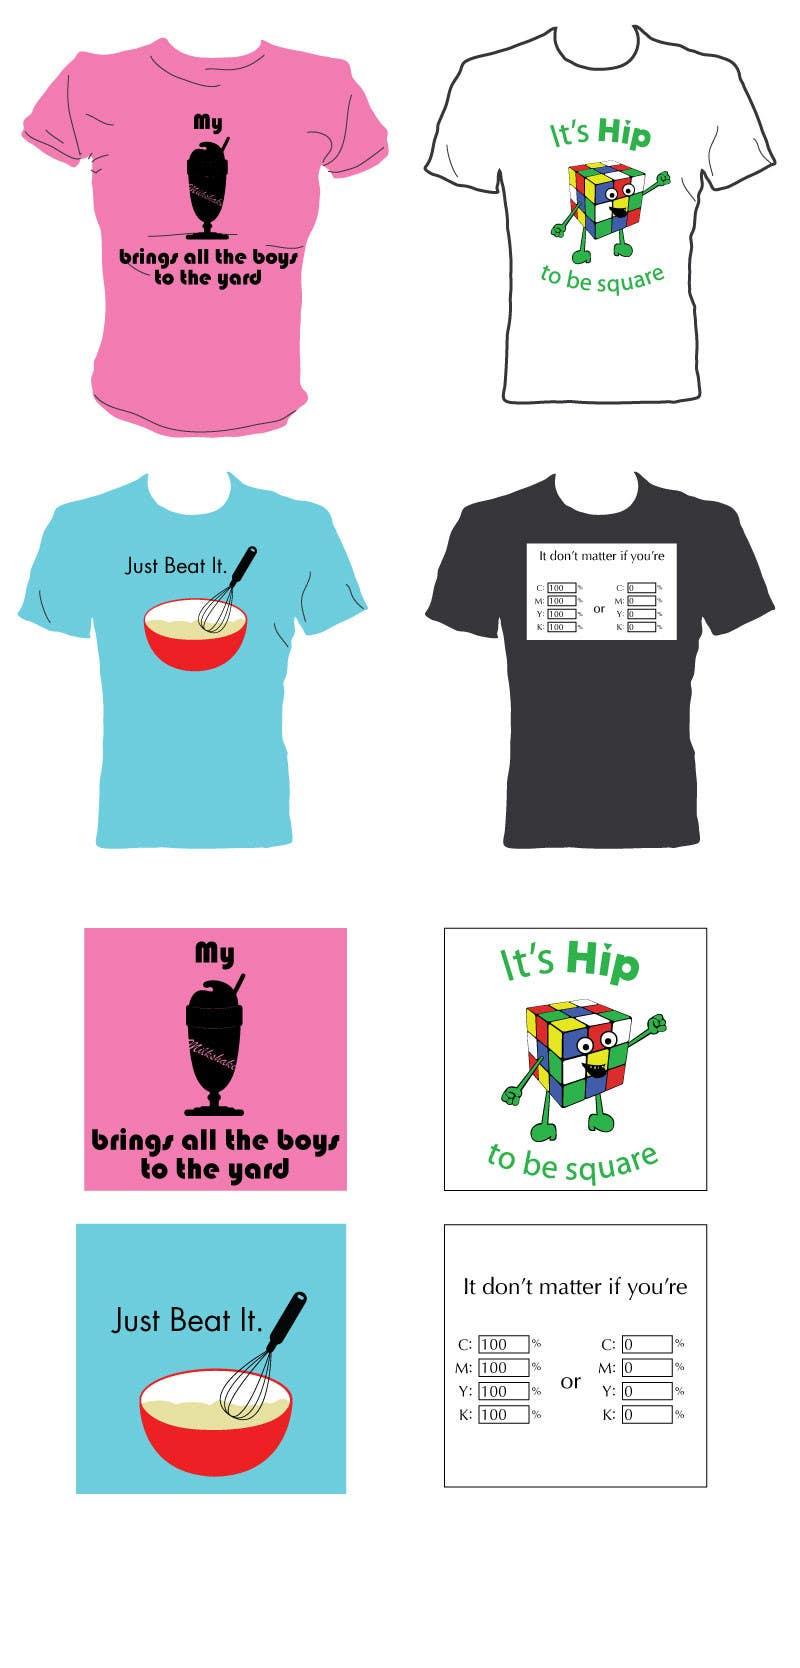 Konkurrenceindlæg #19 for Design 4 funny t-shirts for streetshirts.com